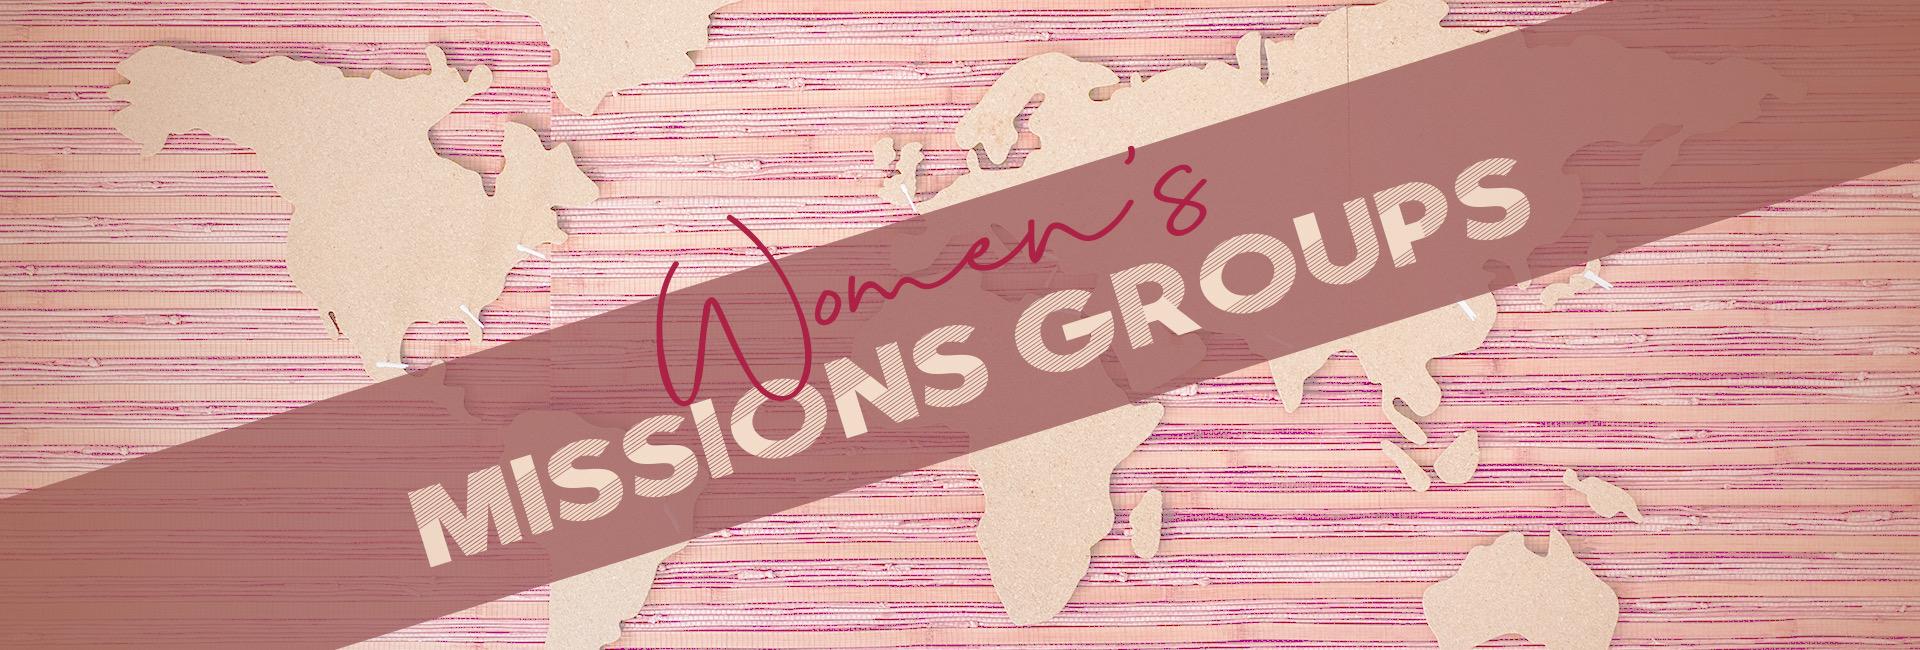 women's missions header